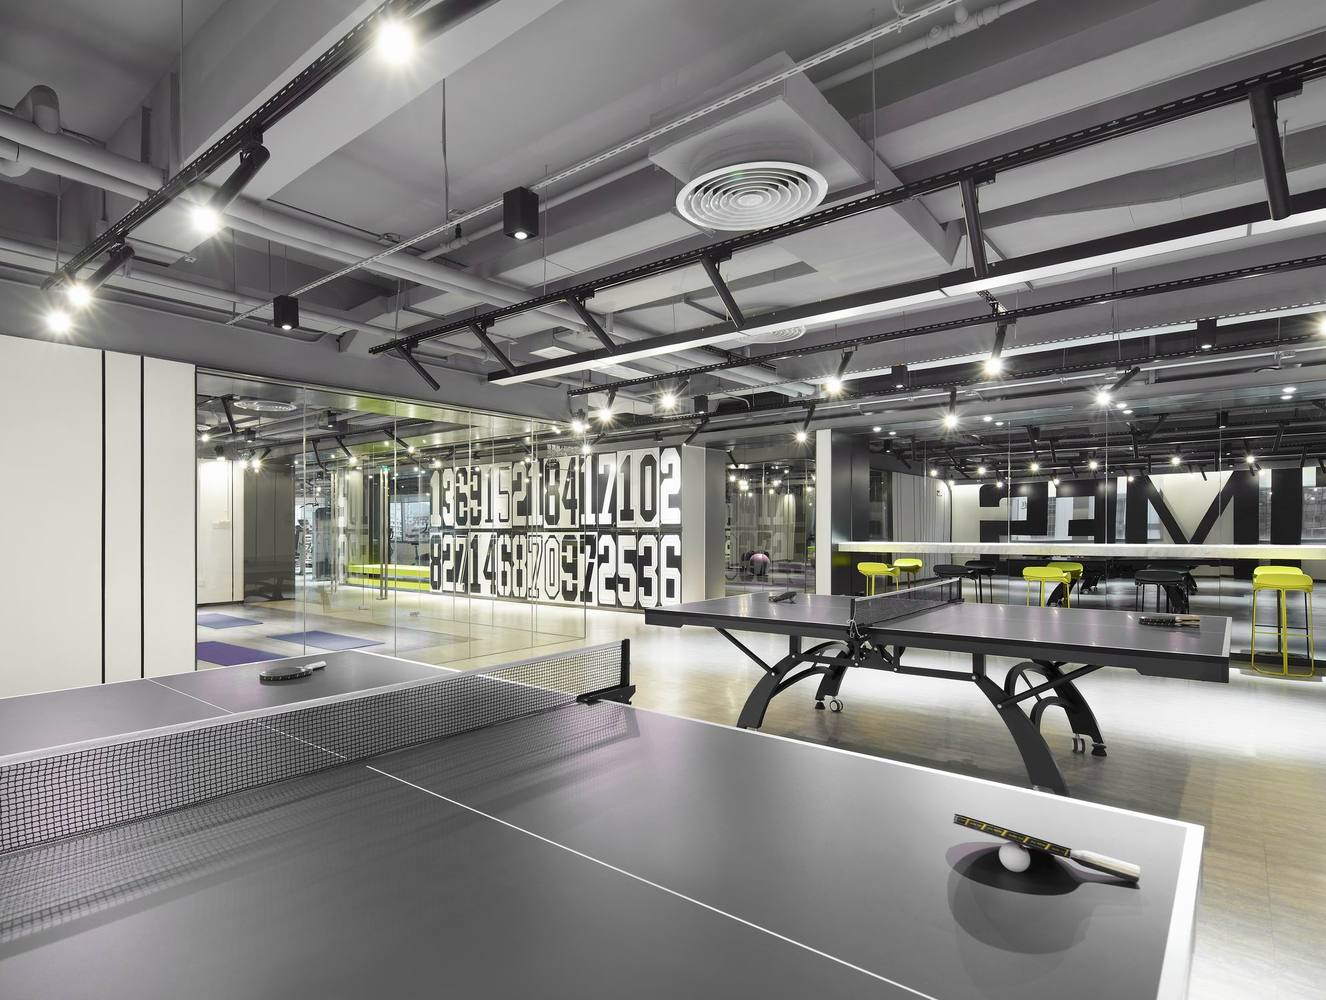 Дизайн спортивного центра – стол для настольного тенниса